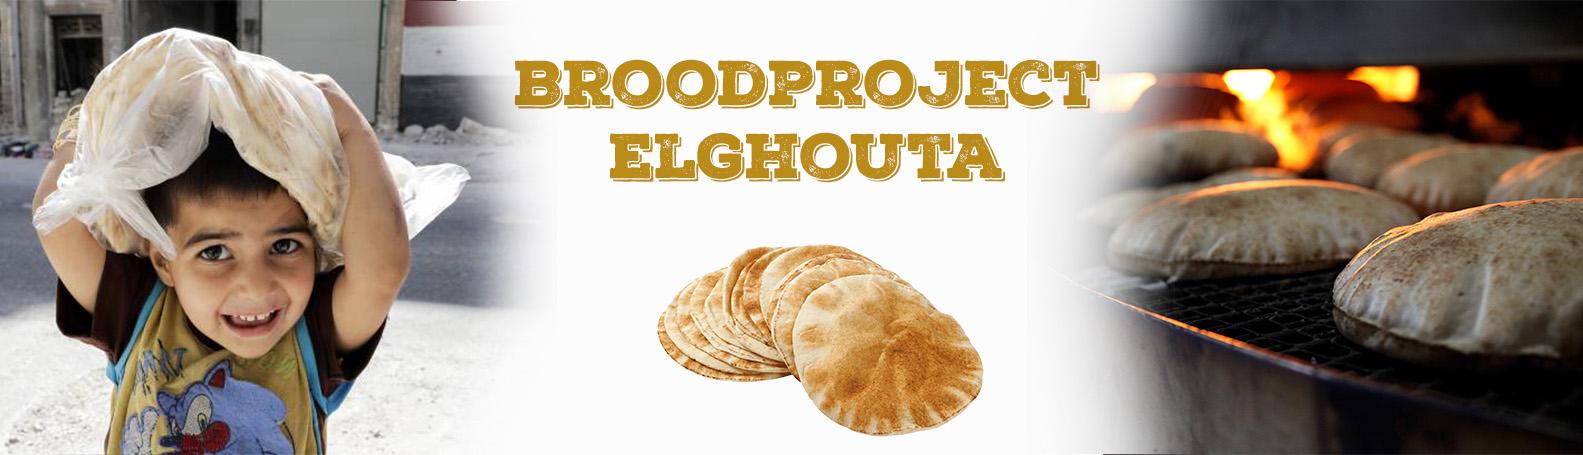 Broodproject website banner